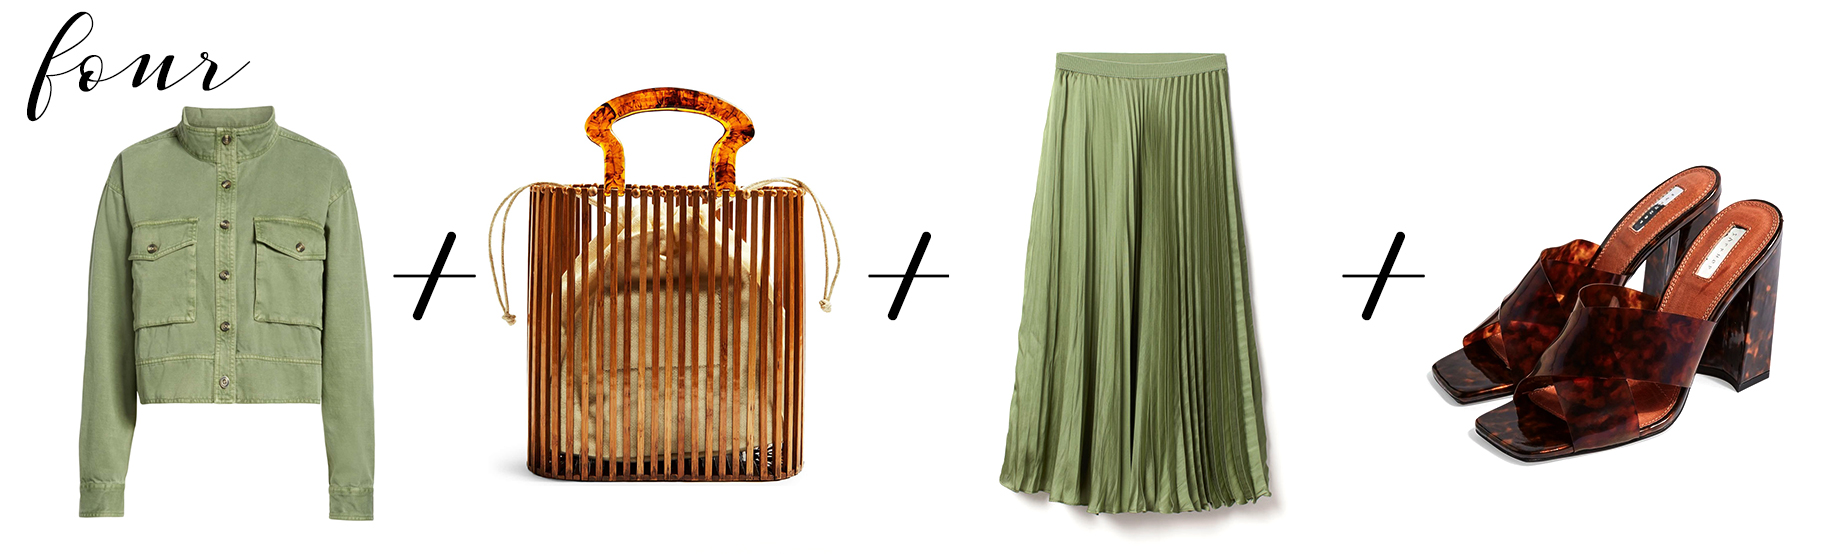 fashion on a budget atlantic-pacific